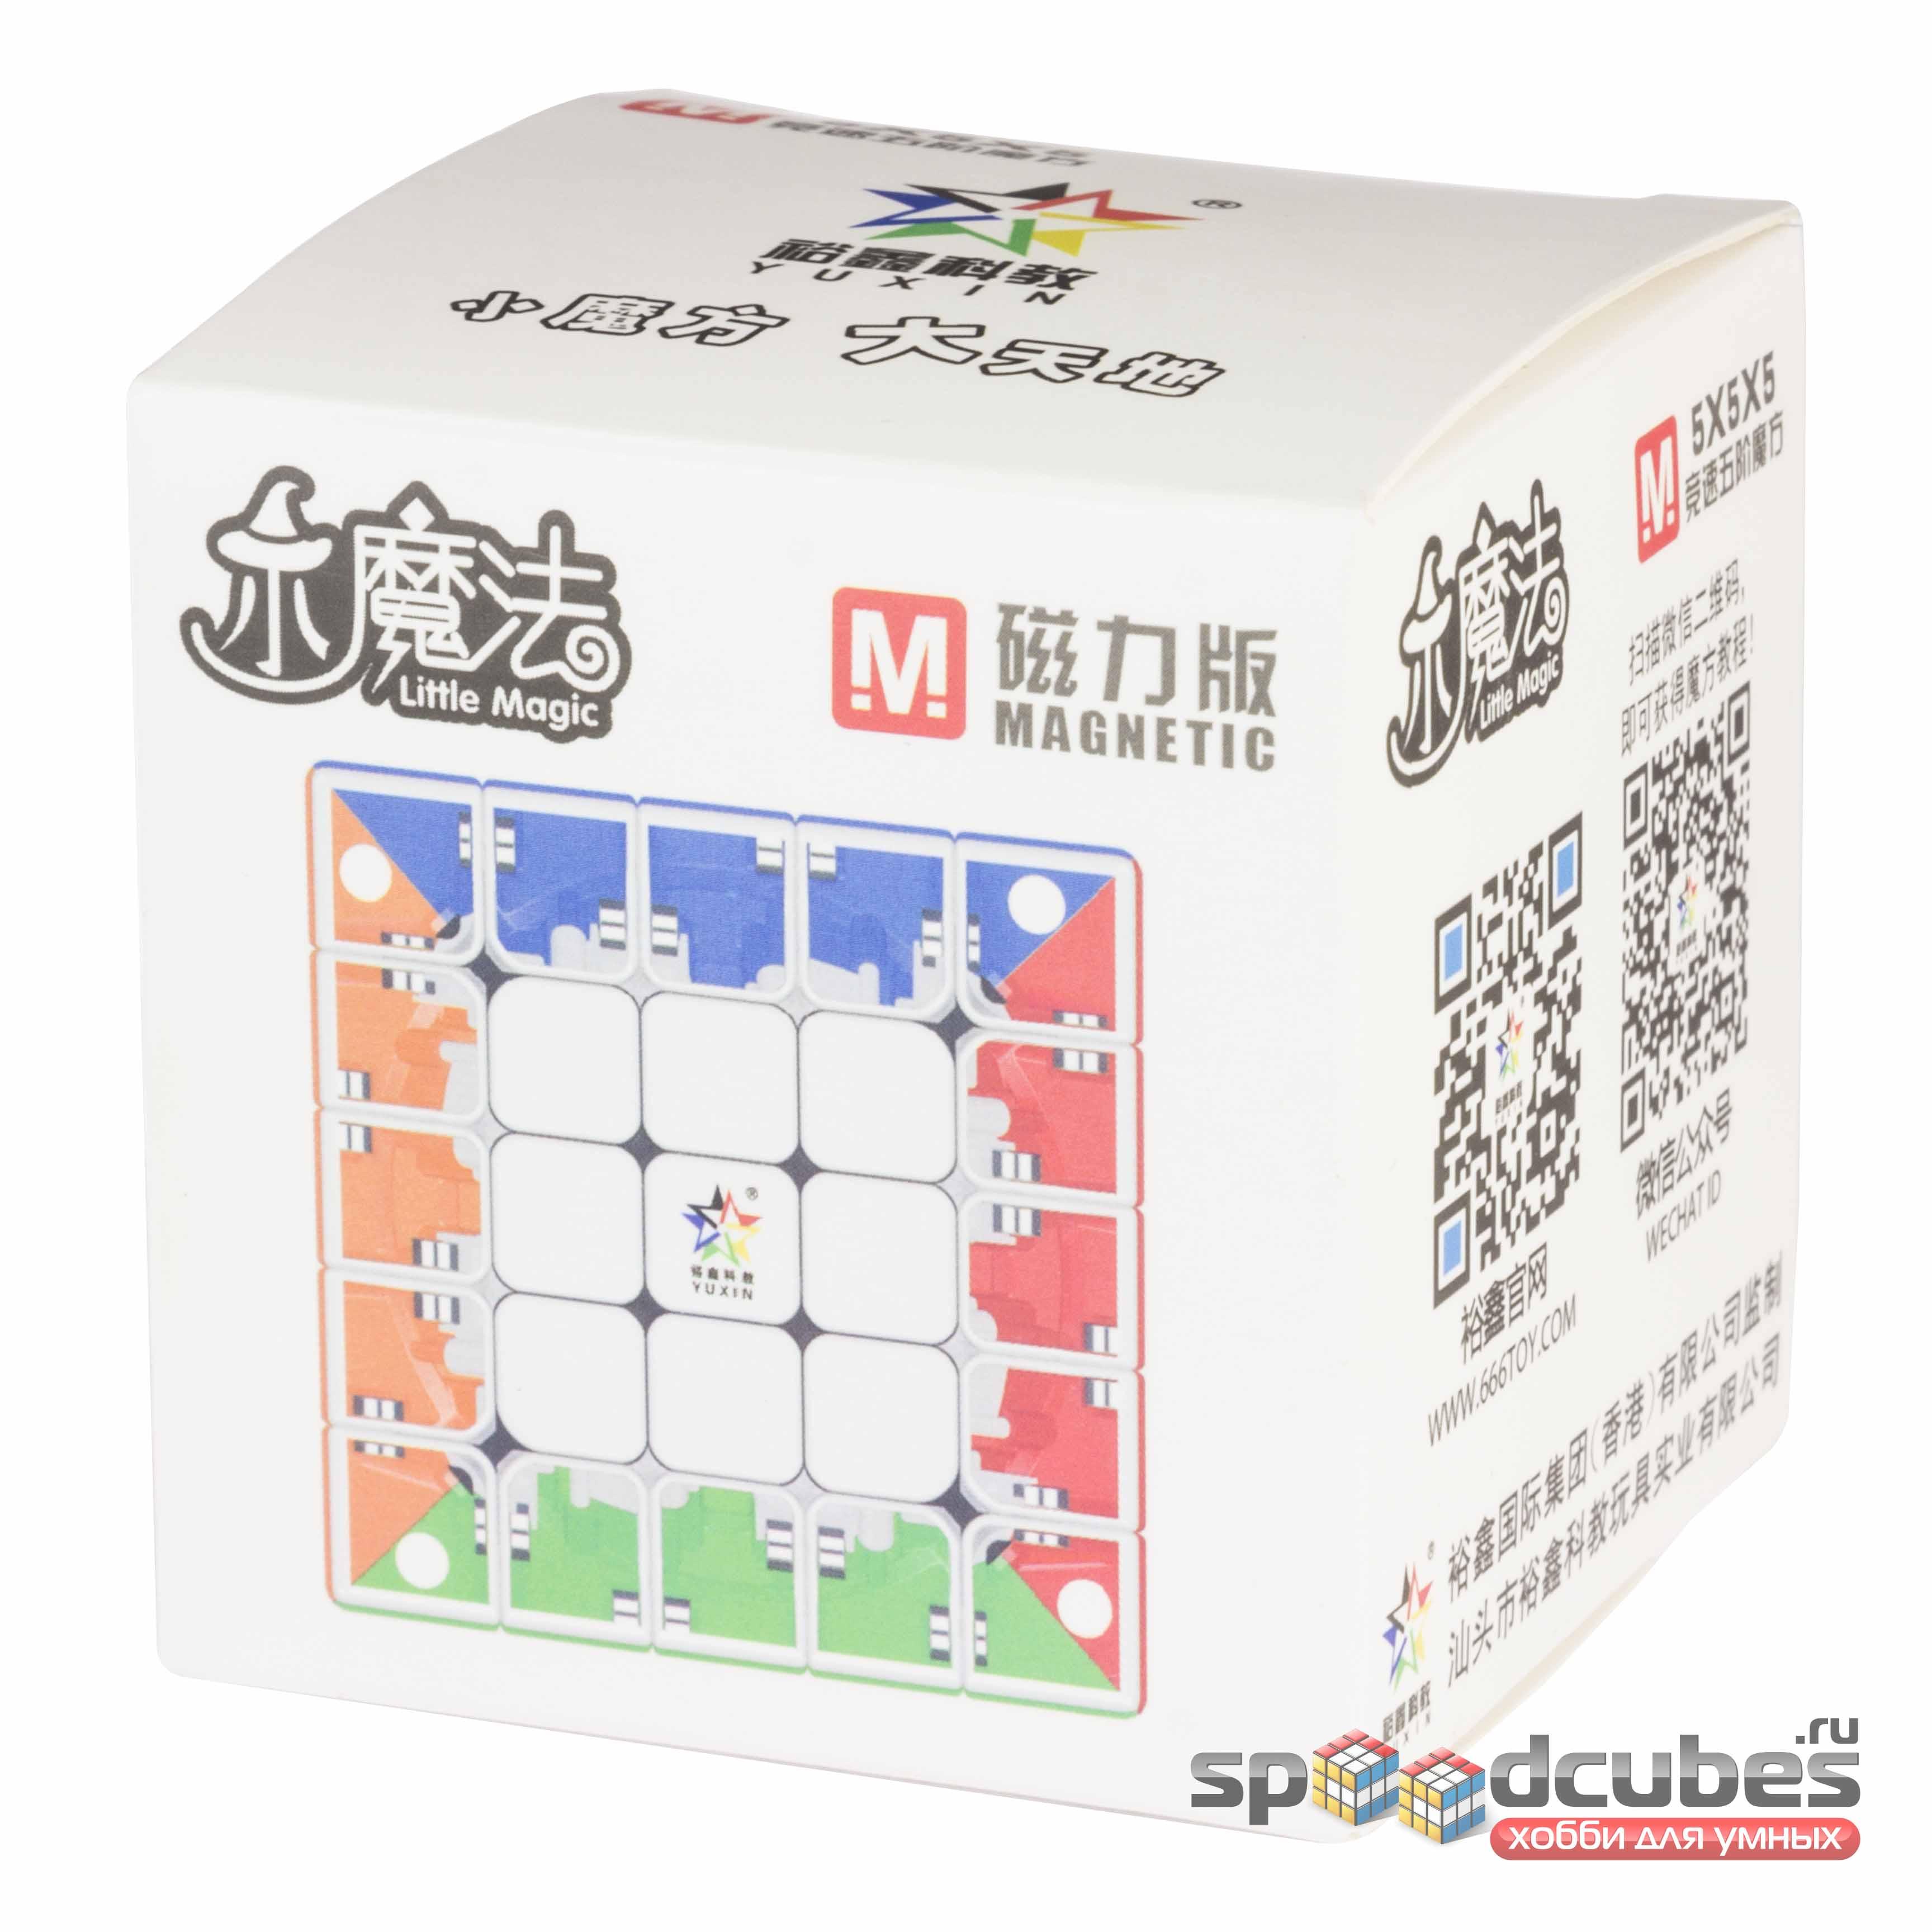 Yuxin 5x5x5 Little Magic M 1